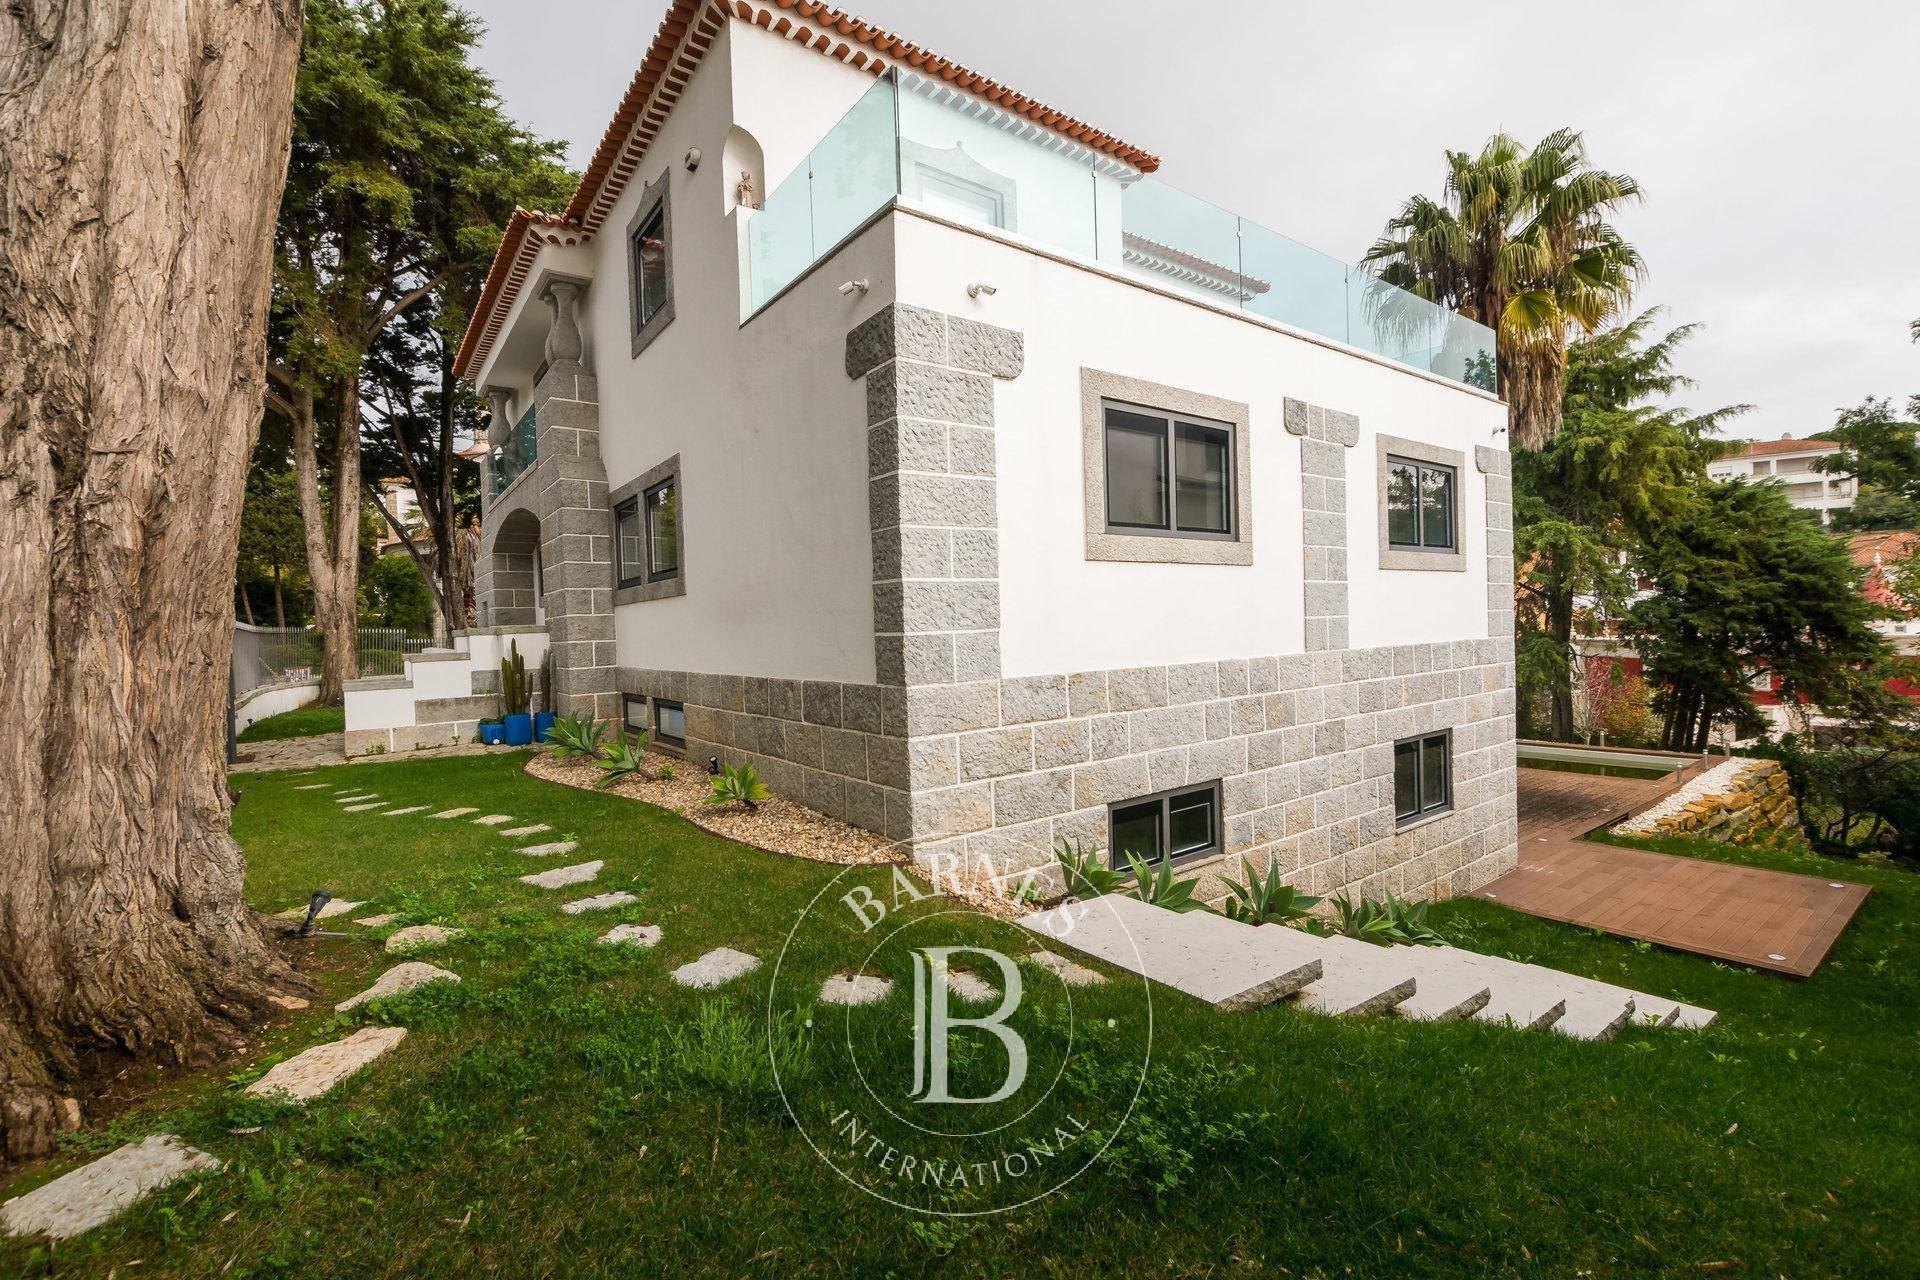 5-bedroom Villa in Estoril